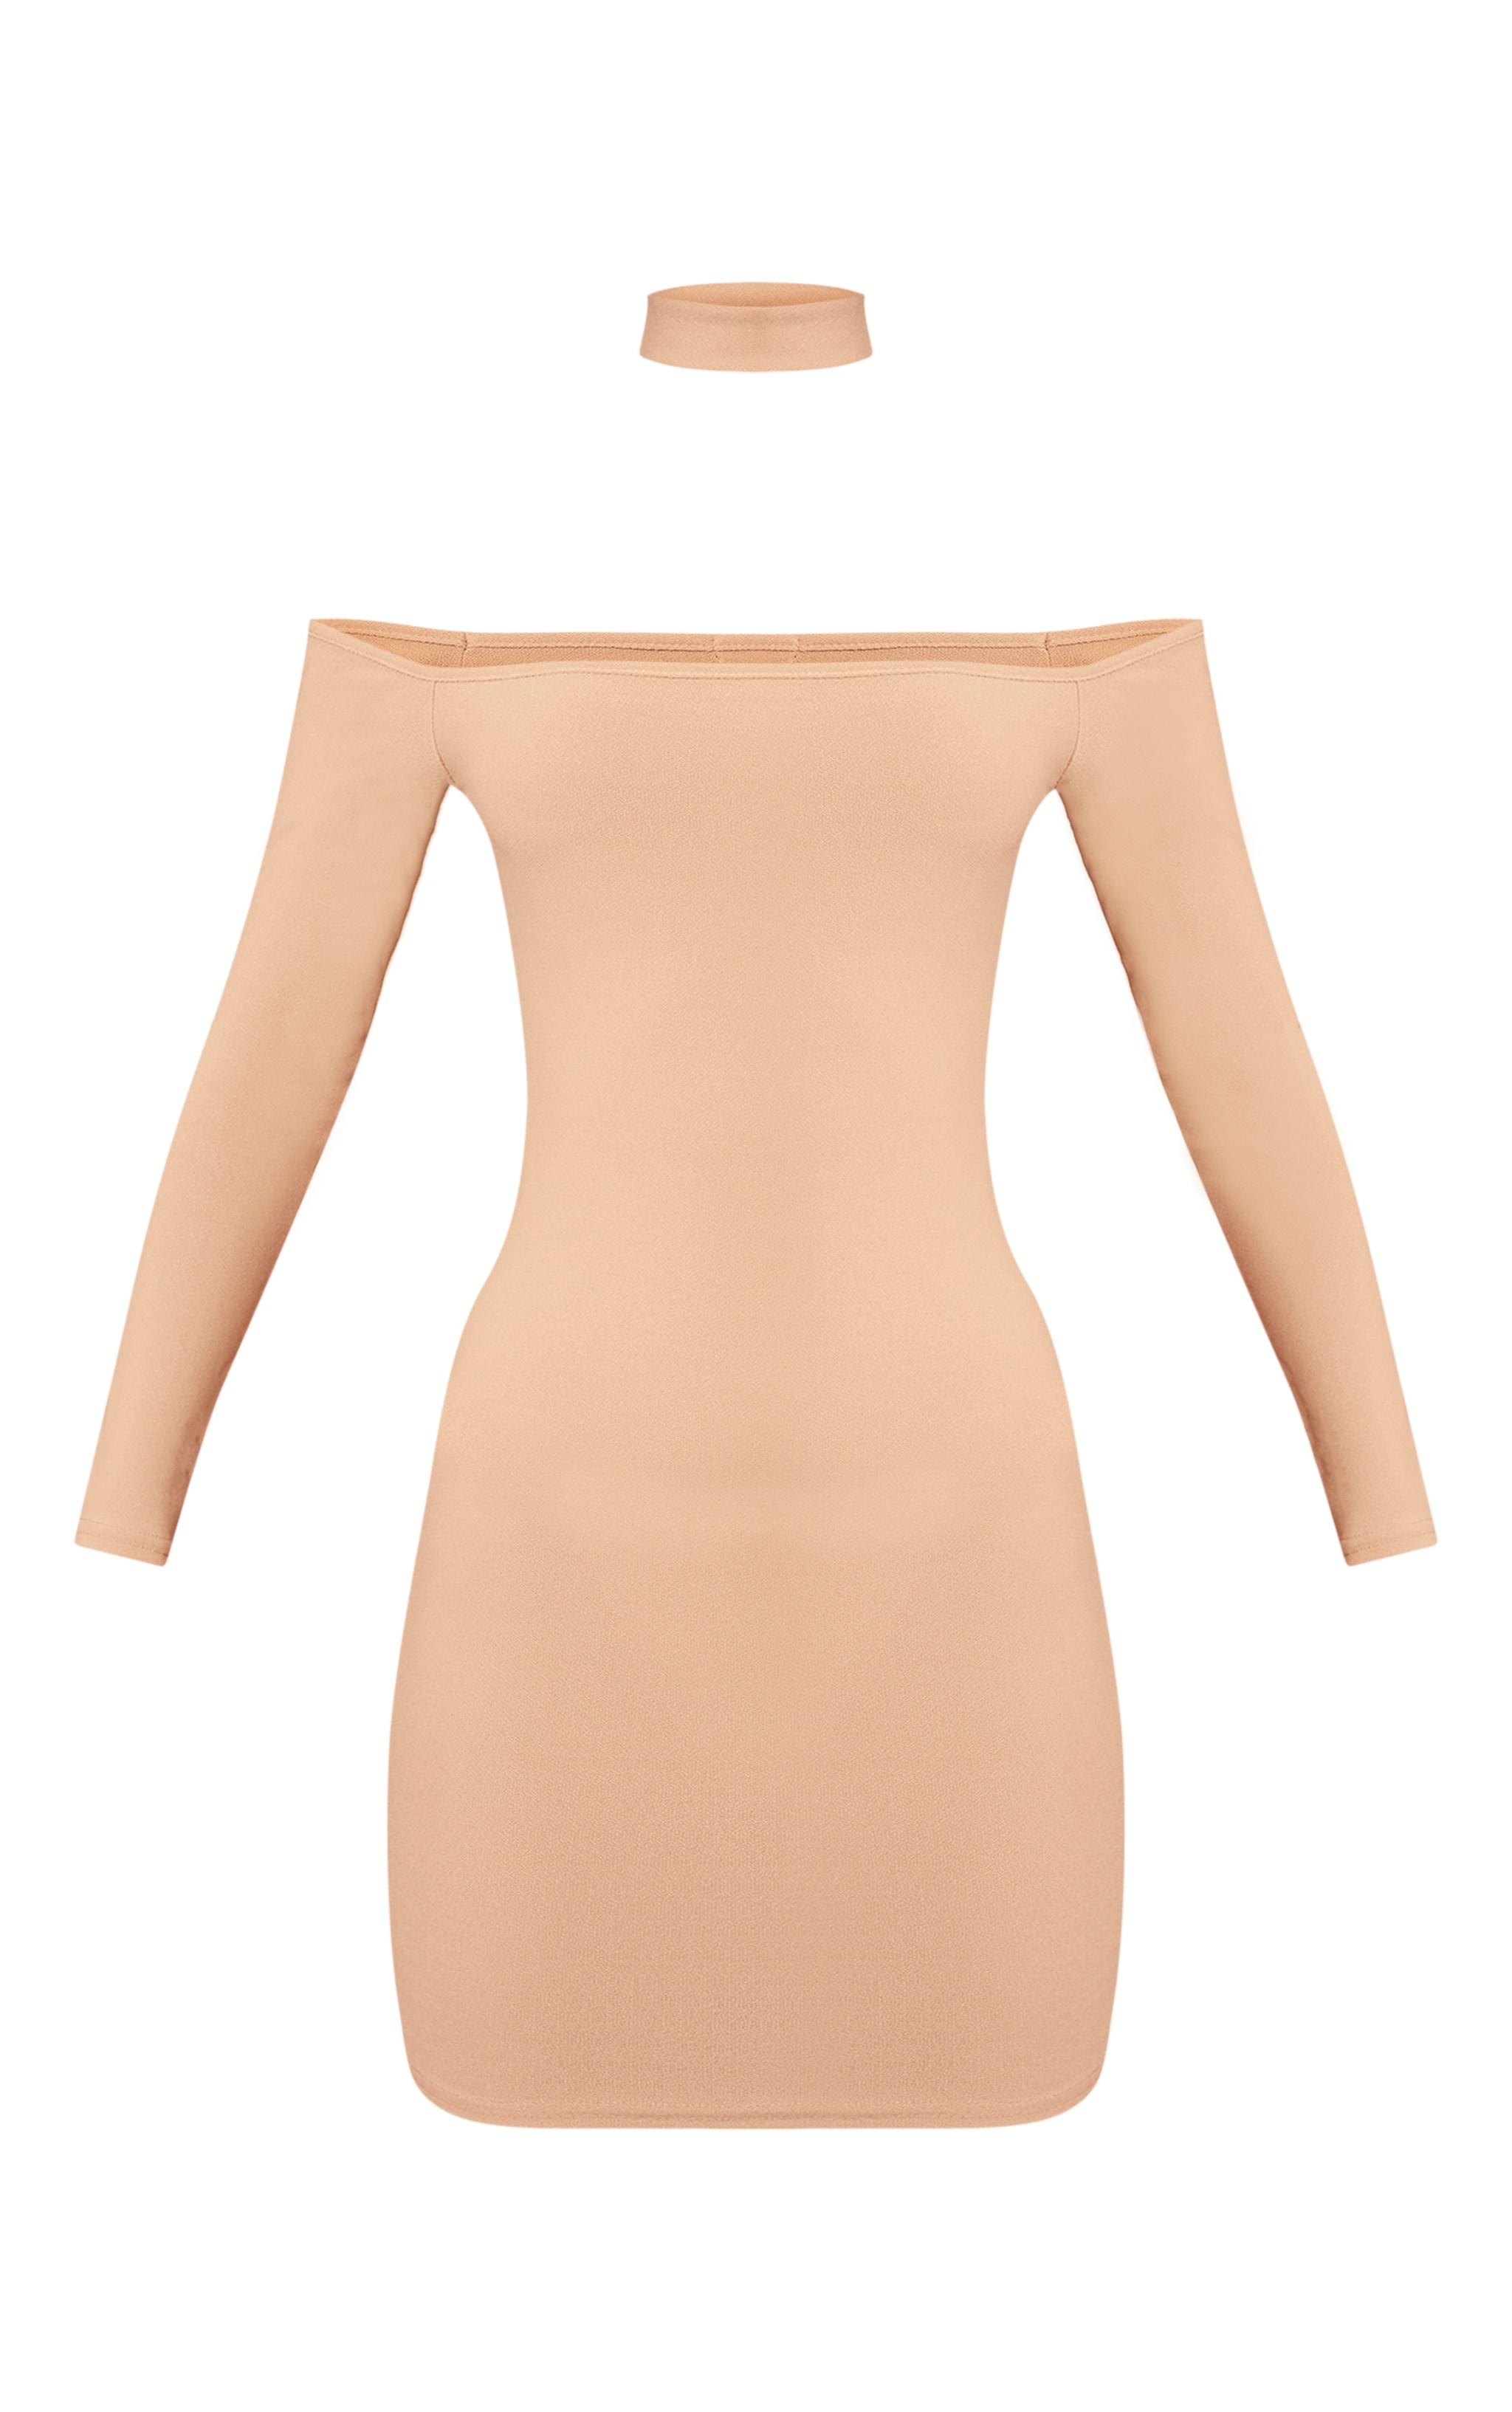 Stone Bardot Choker Detail Long Sleeve Bodycon Dress 3